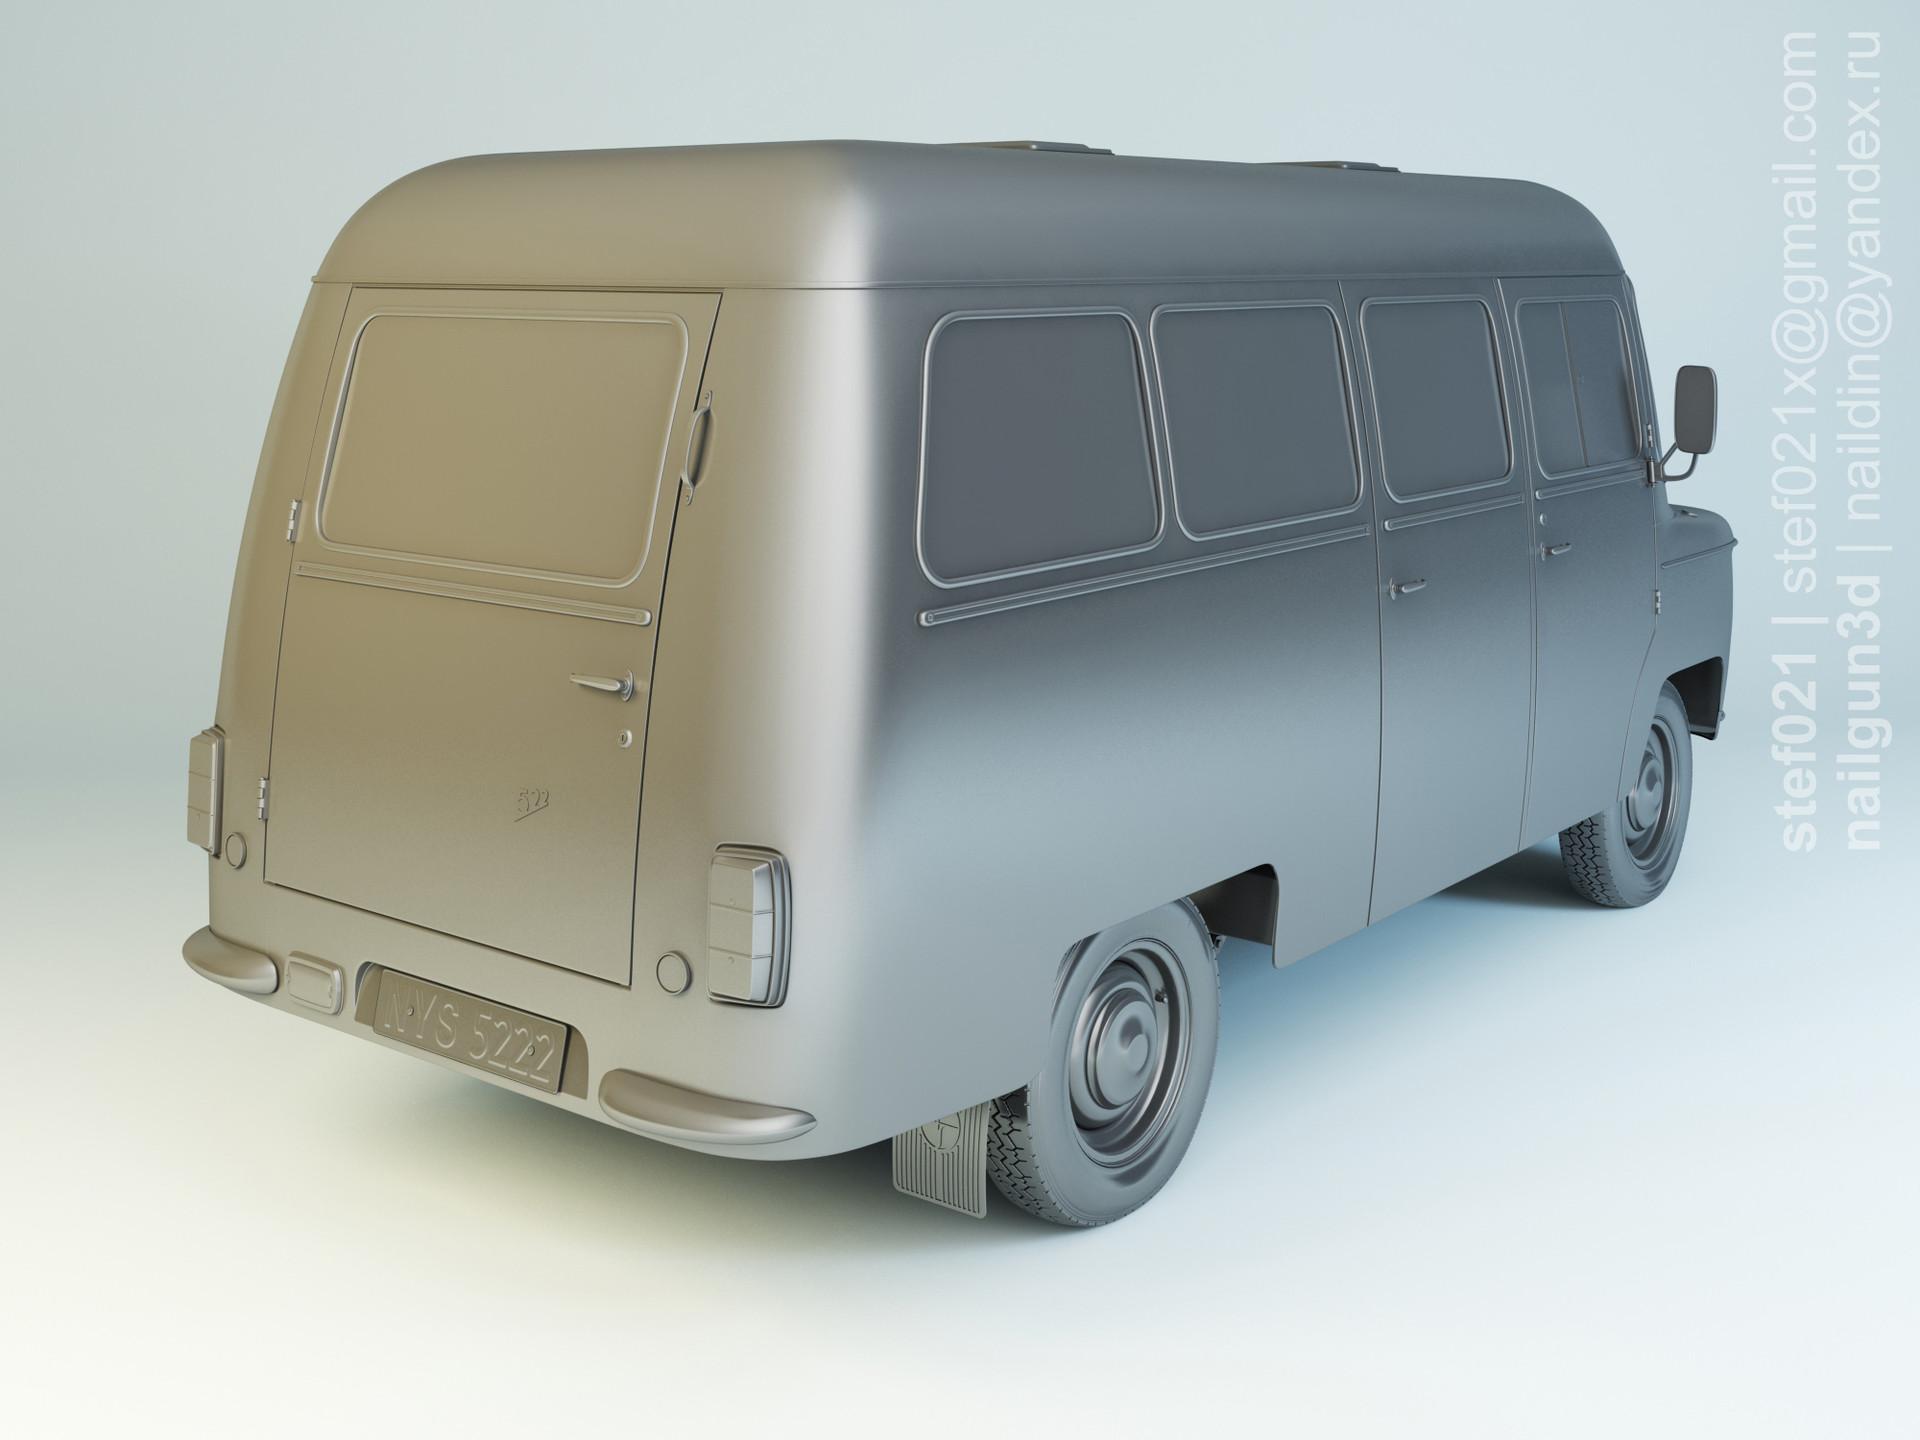 Nail khusnutdinov als 205 001 nysa 522 modelling 1